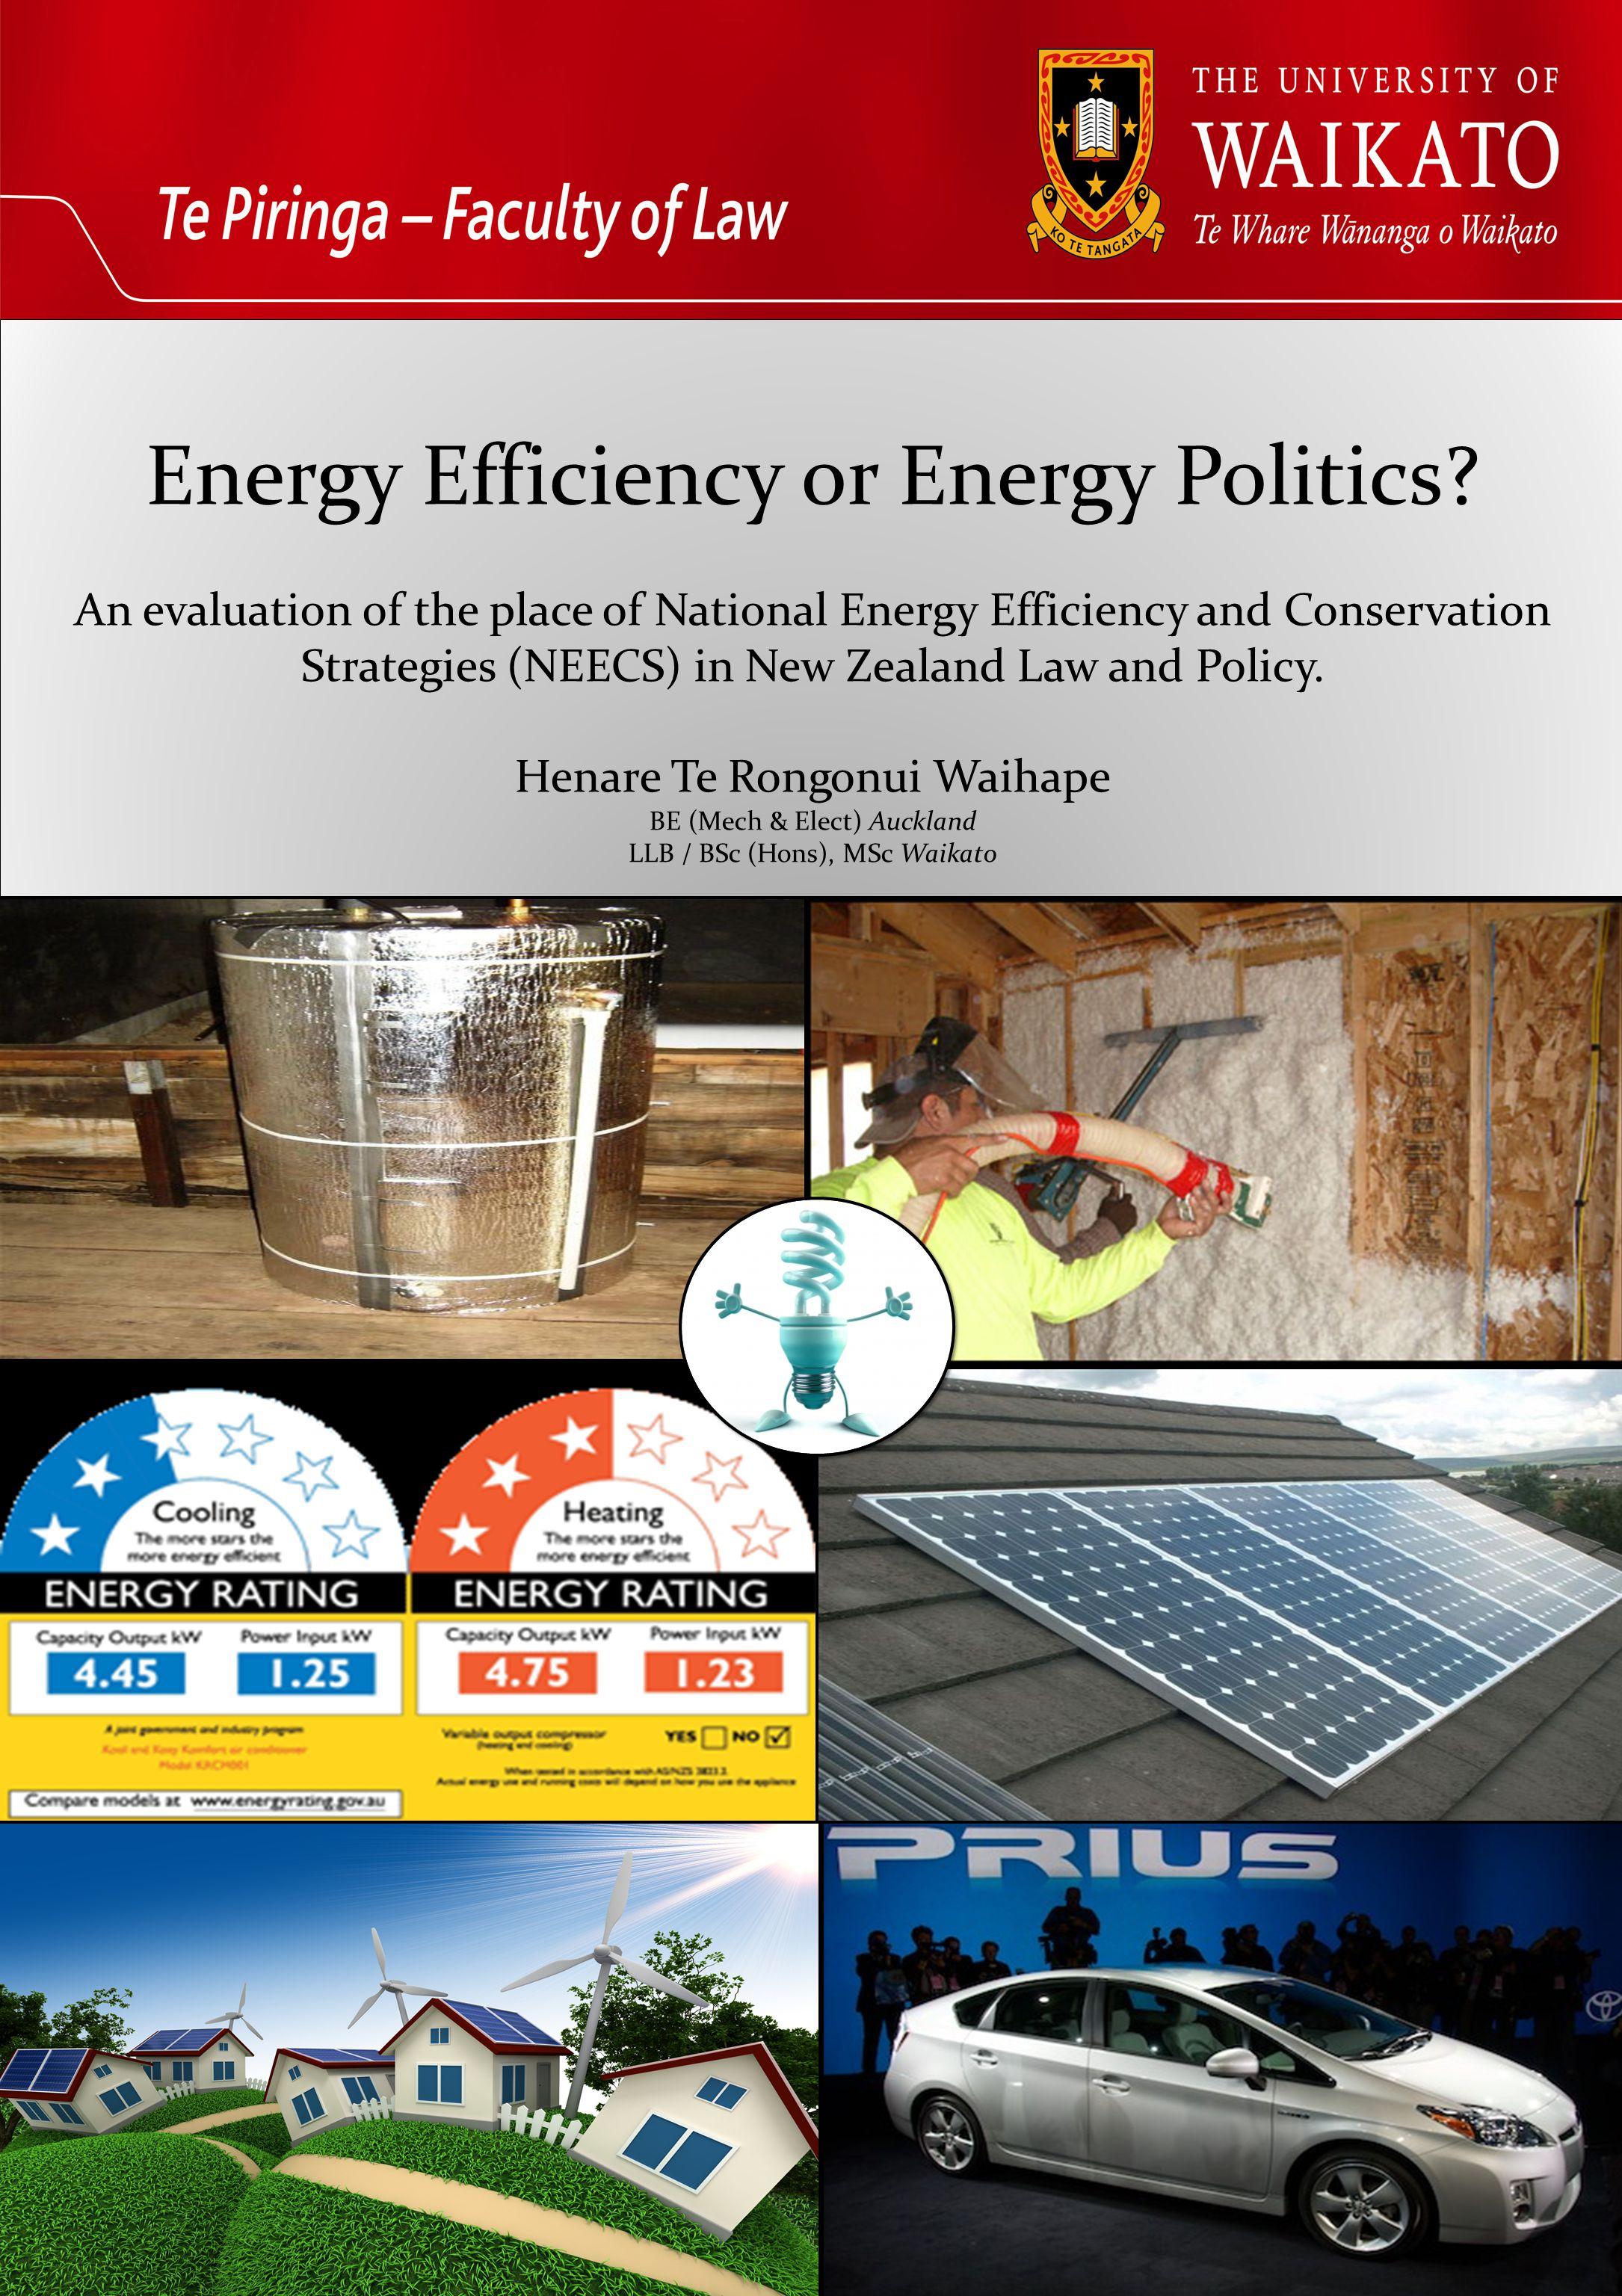 Energy Efficiency or Energy Politics.